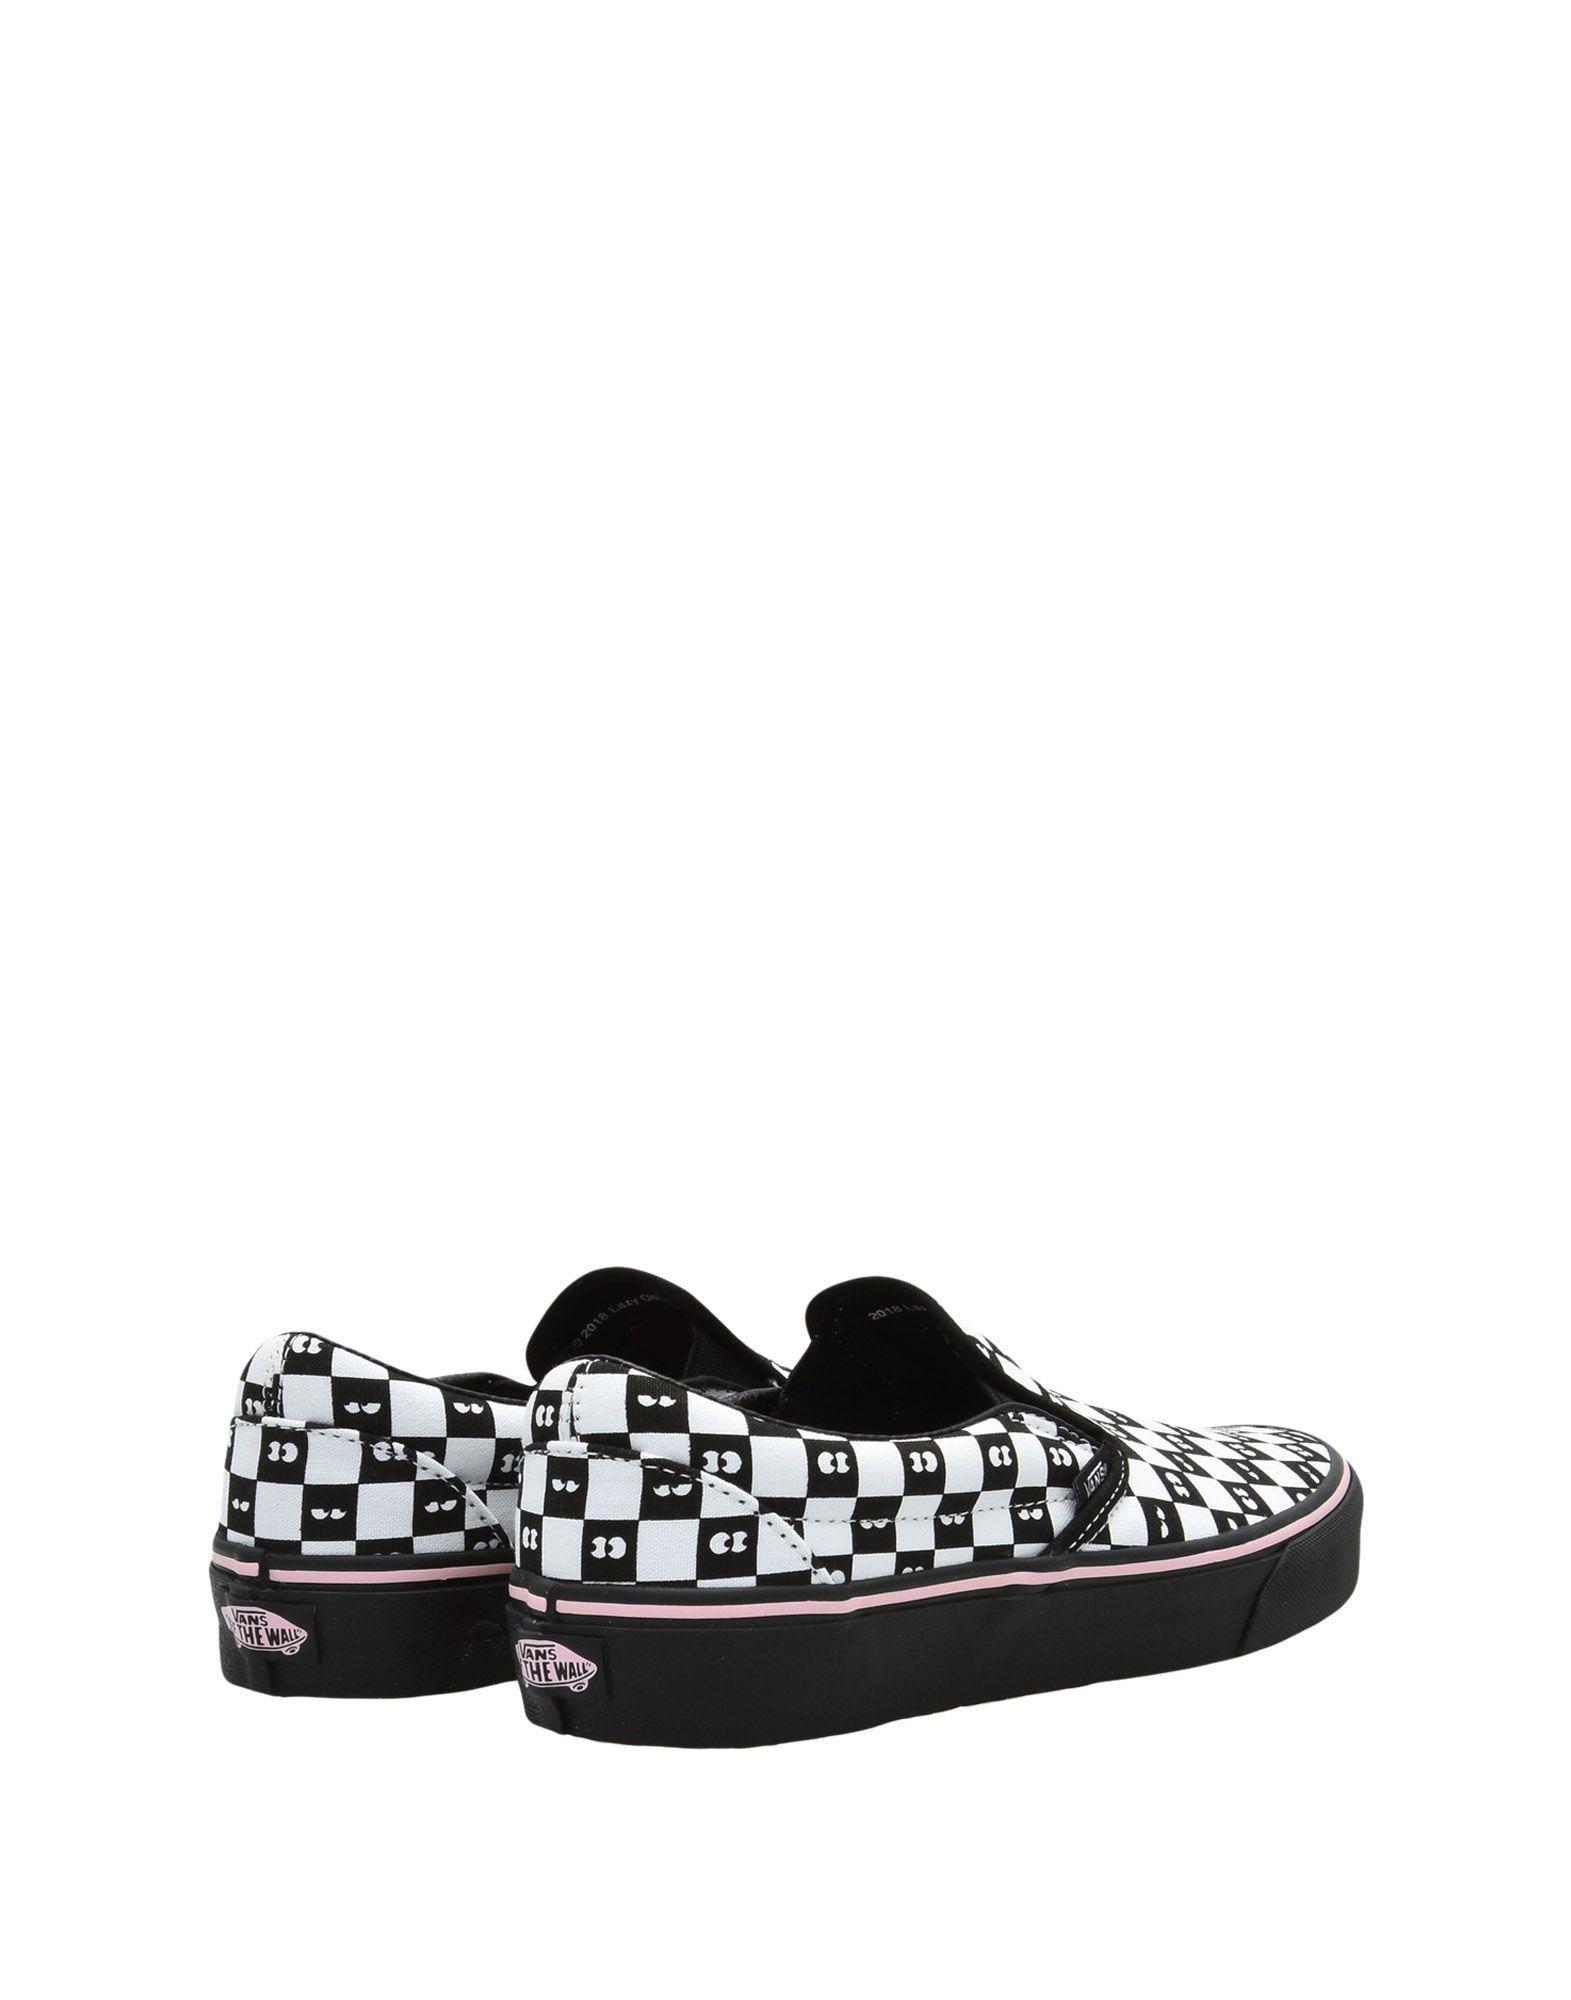 Vans 11496597IT Ua Classic Slip 11496597IT Vans Gute Qualität beliebte Schuhe a5ae9a